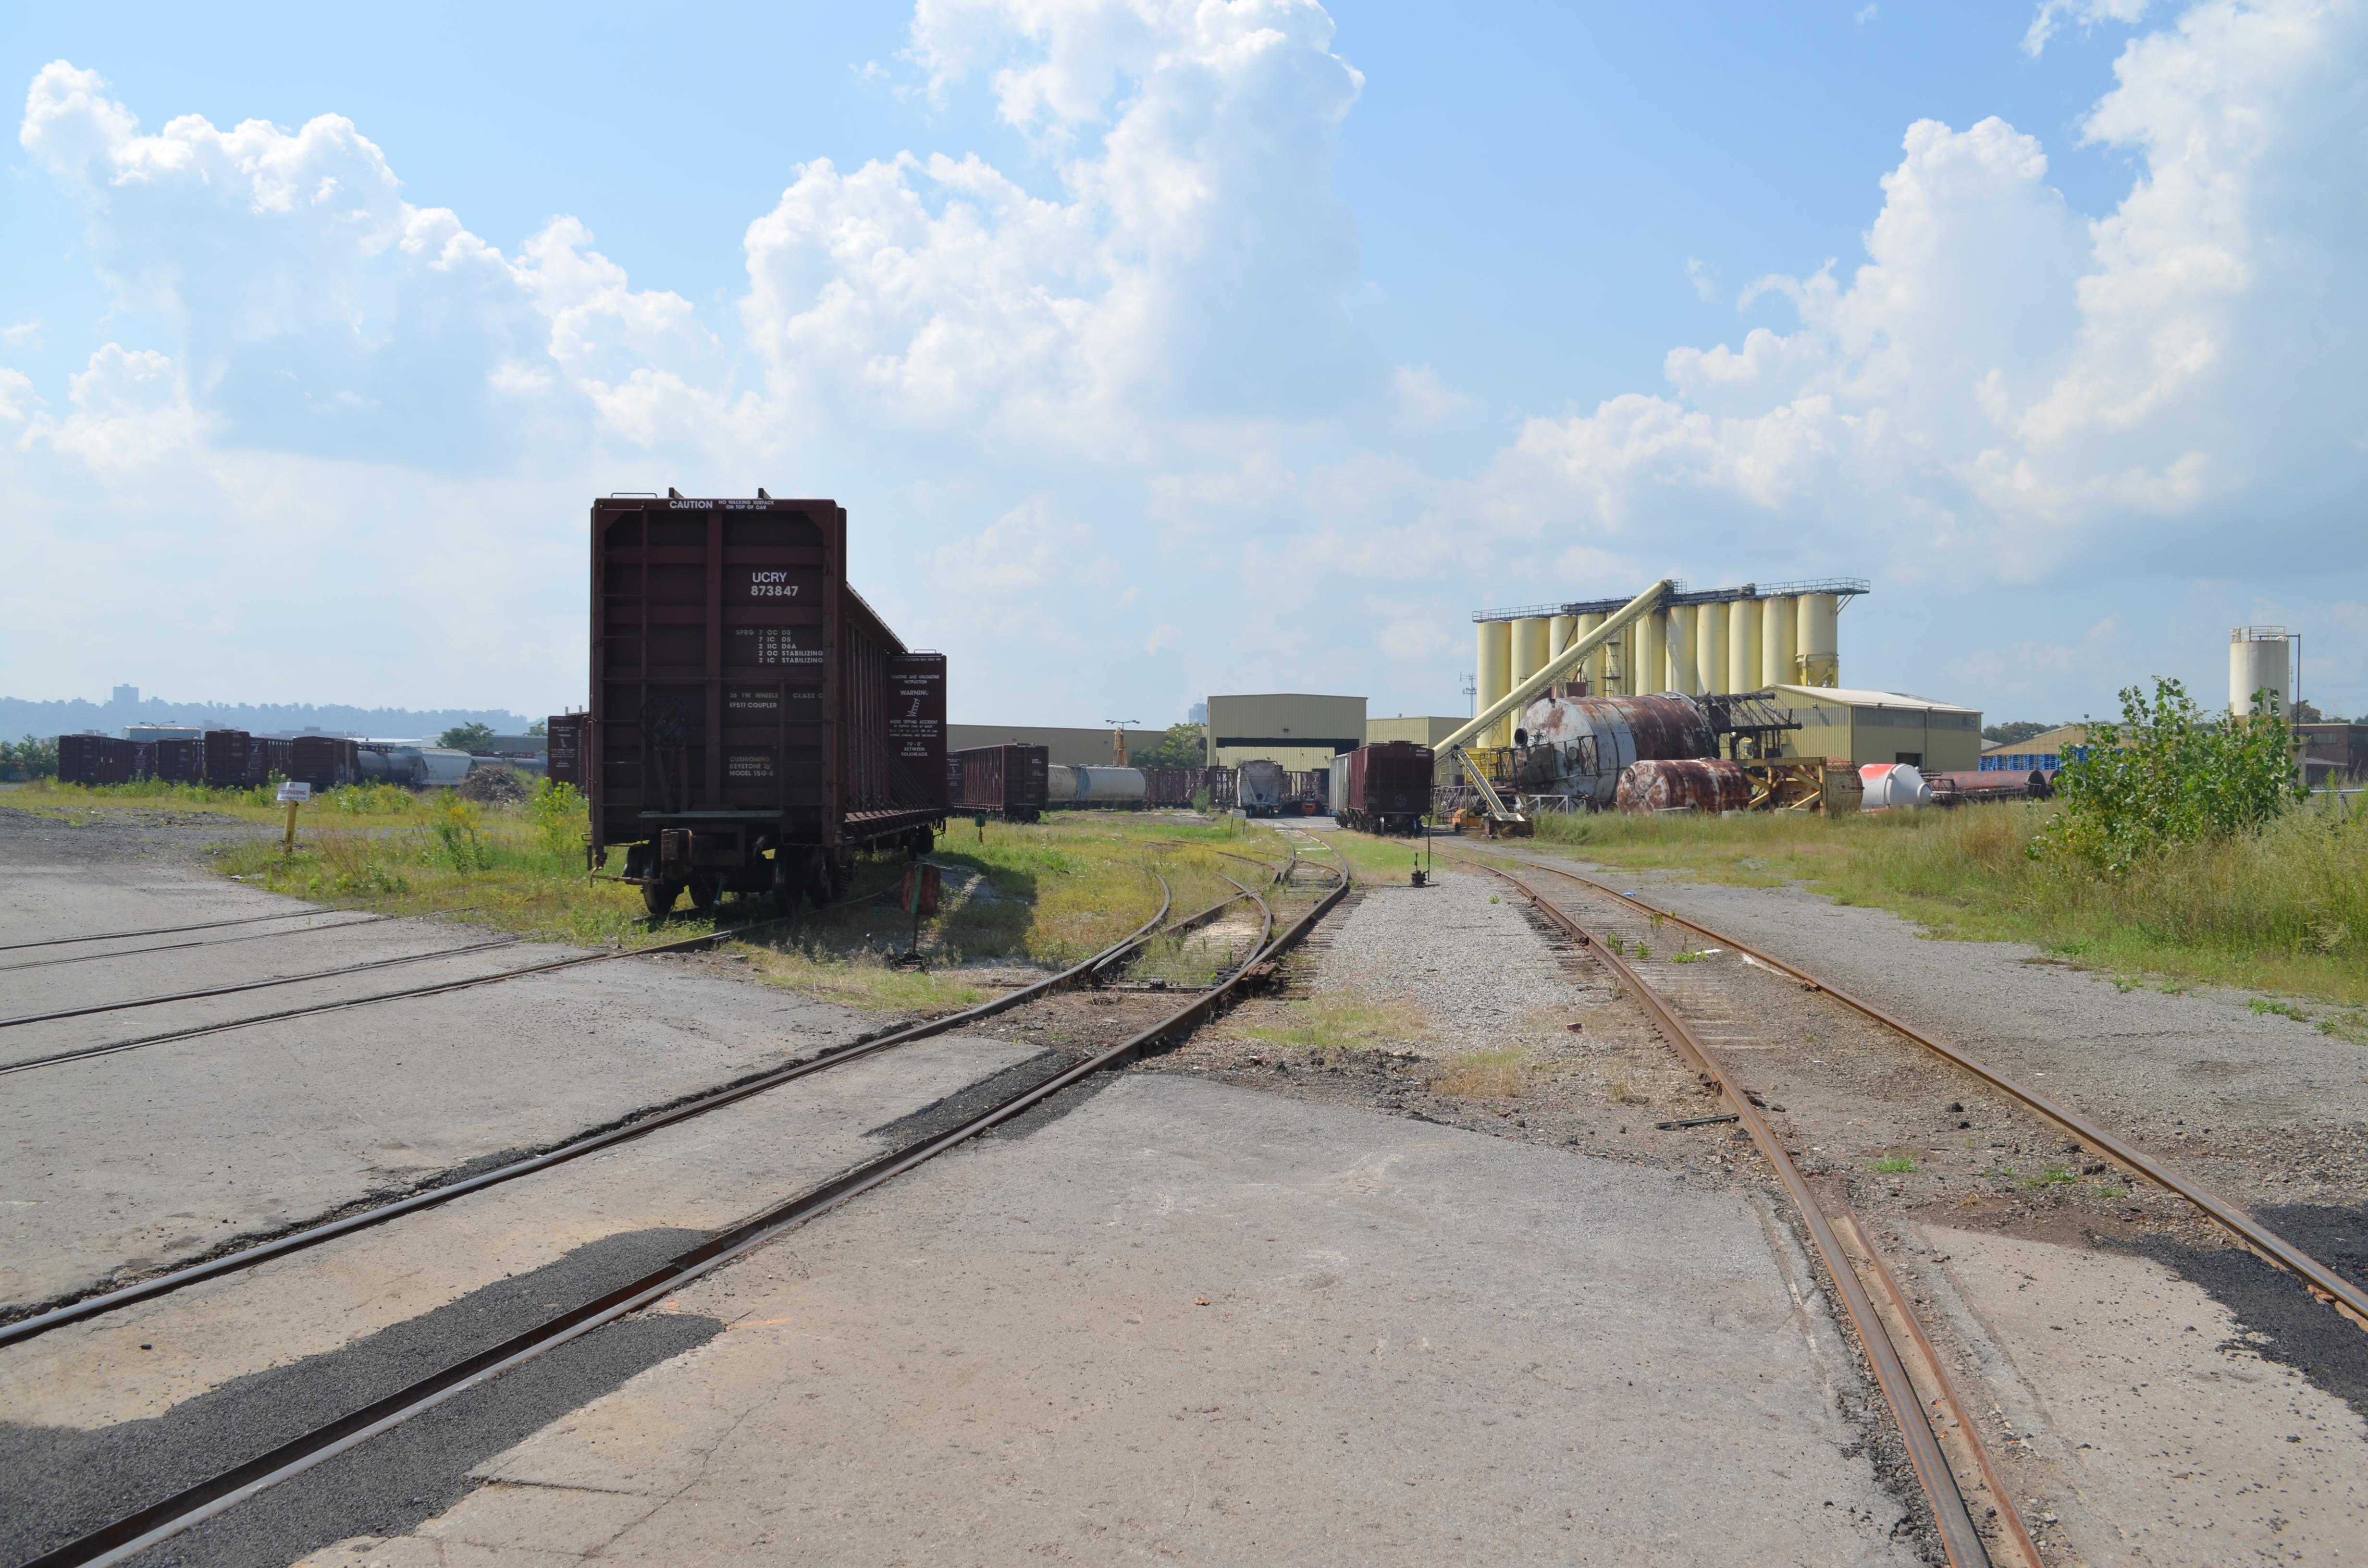 film_location_railtracks